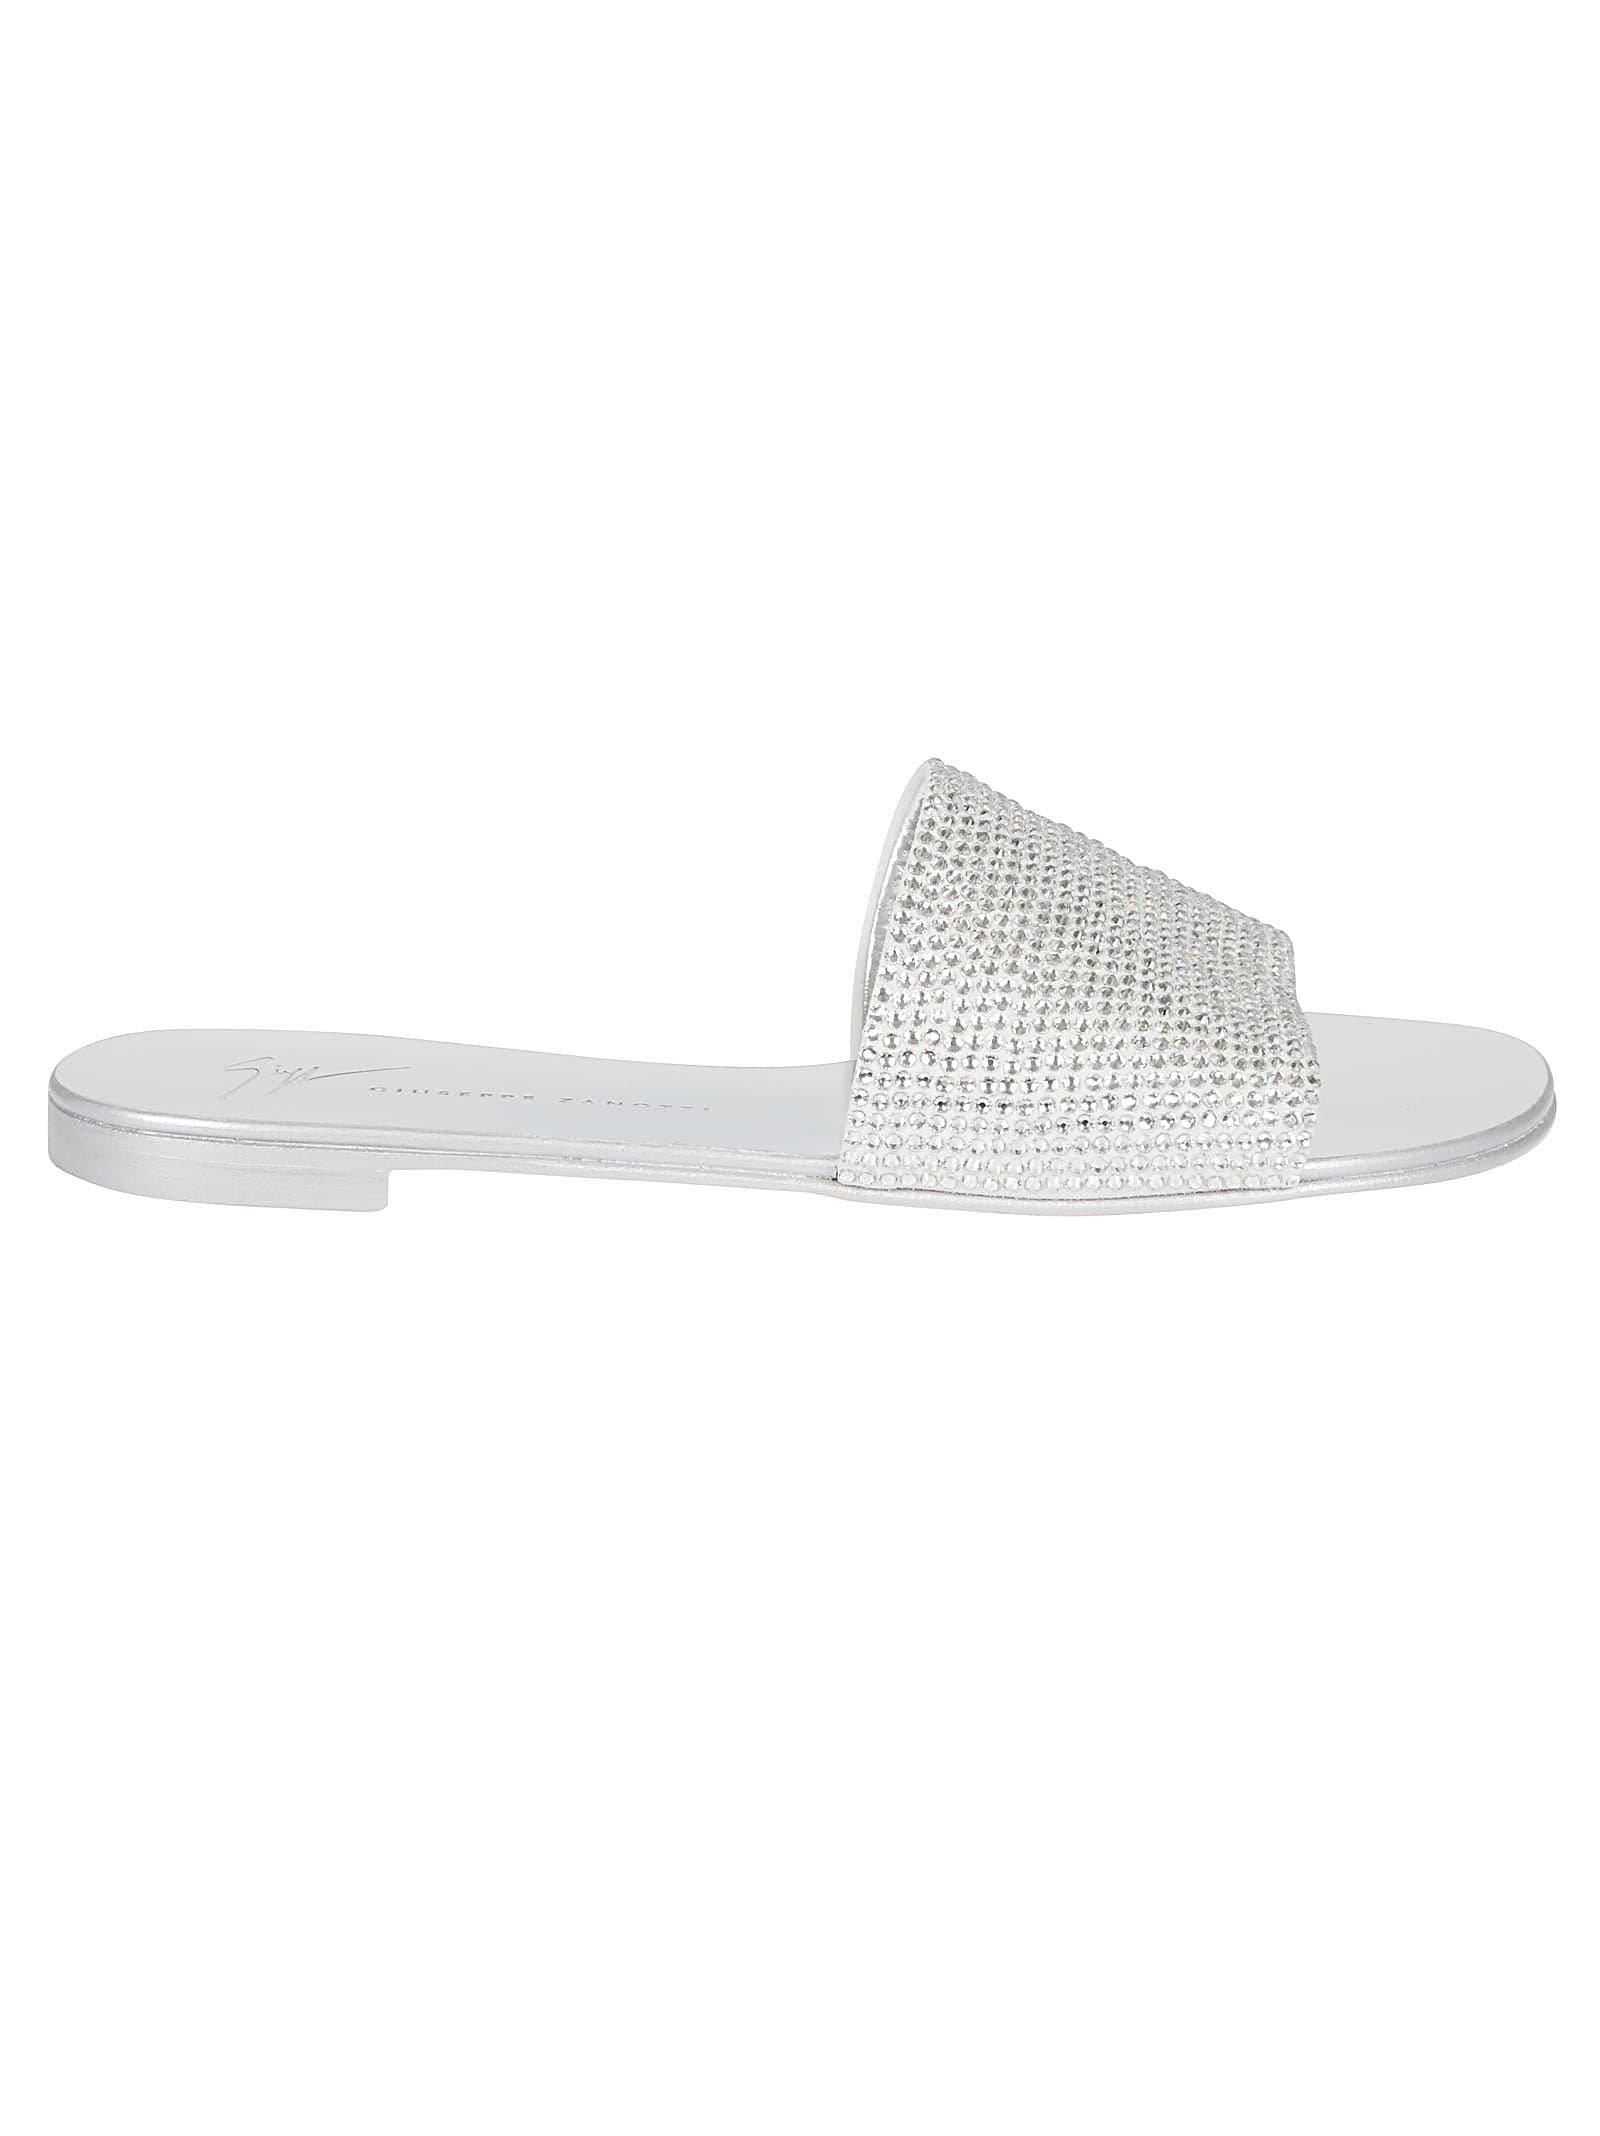 Giuseppe Zanotti Adelia Crystal Sandals